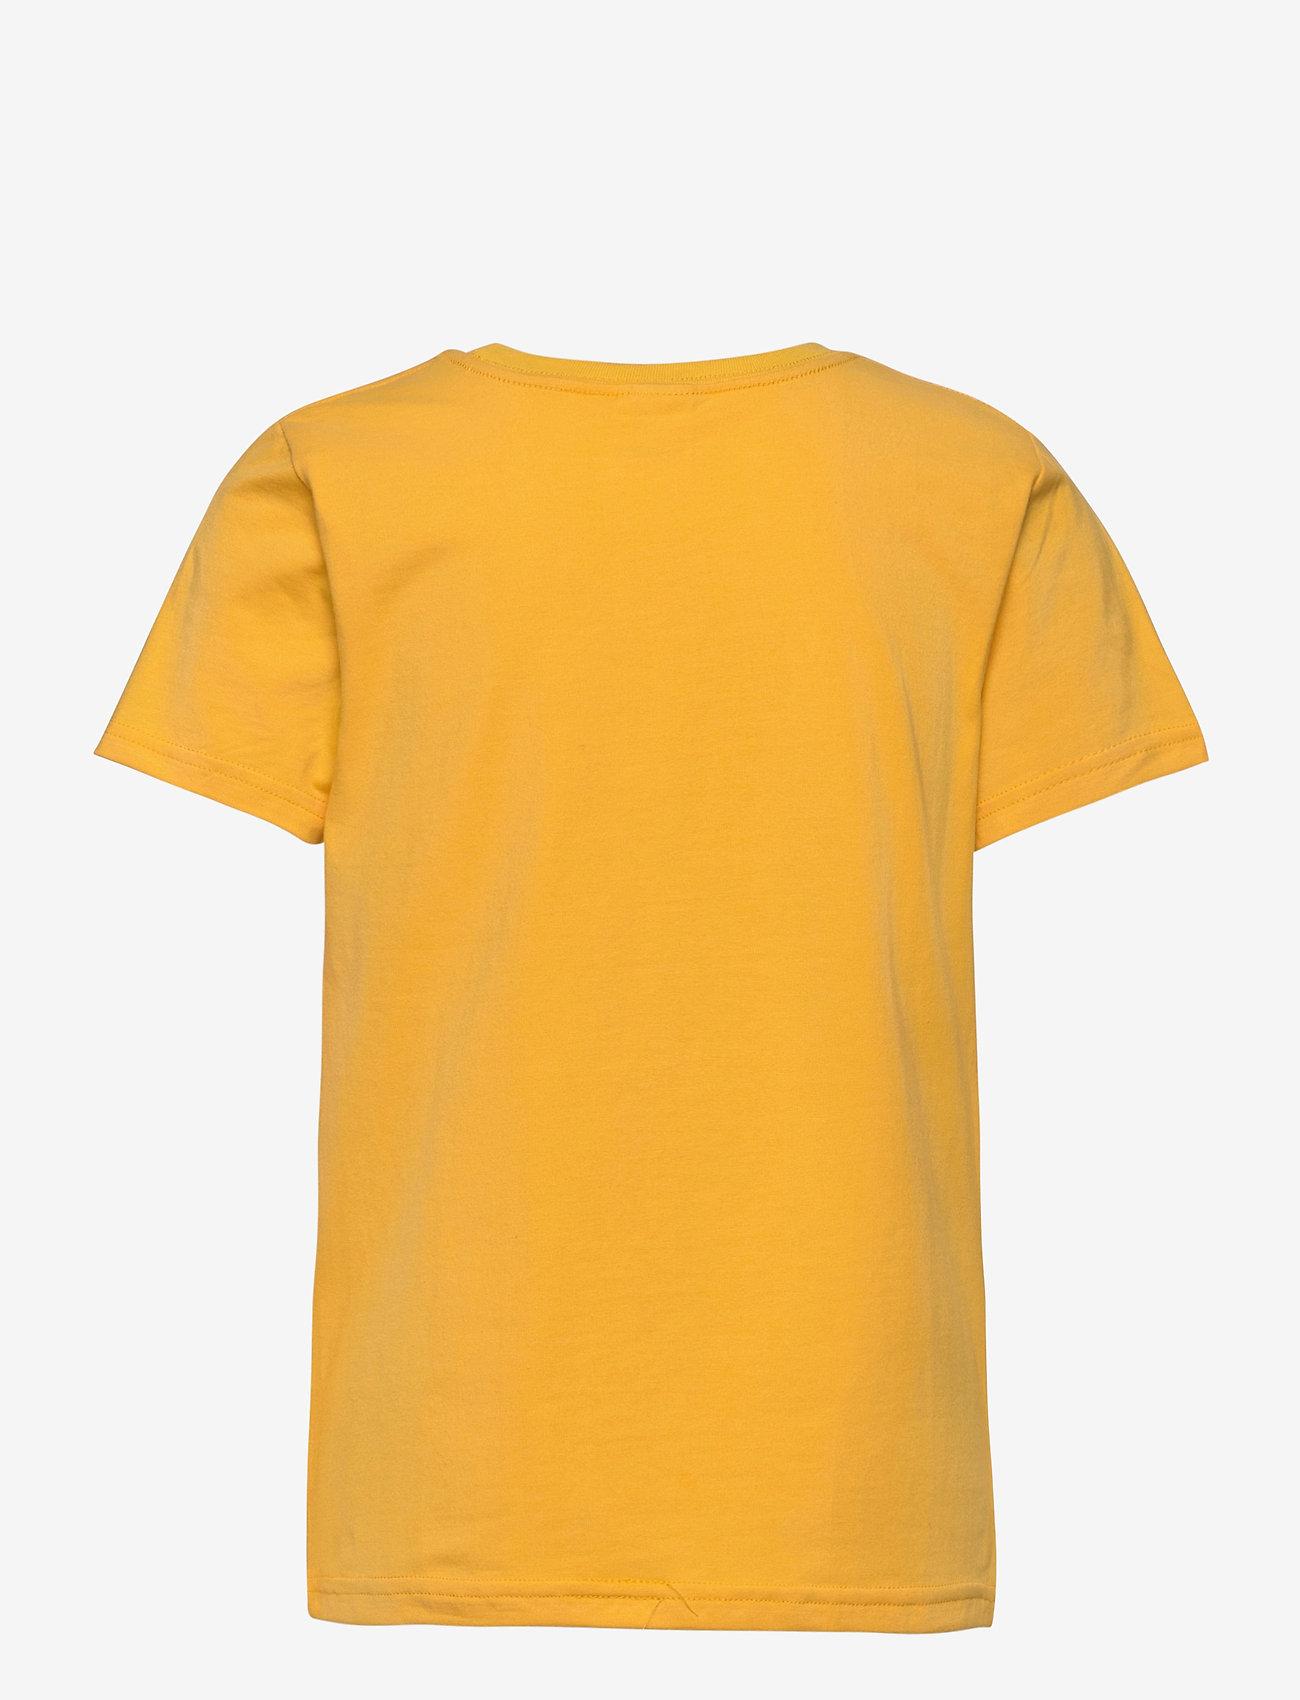 Happy Emil T-shirt (Yellow) (16.80 €) - Emil i Lönneberga FChdC